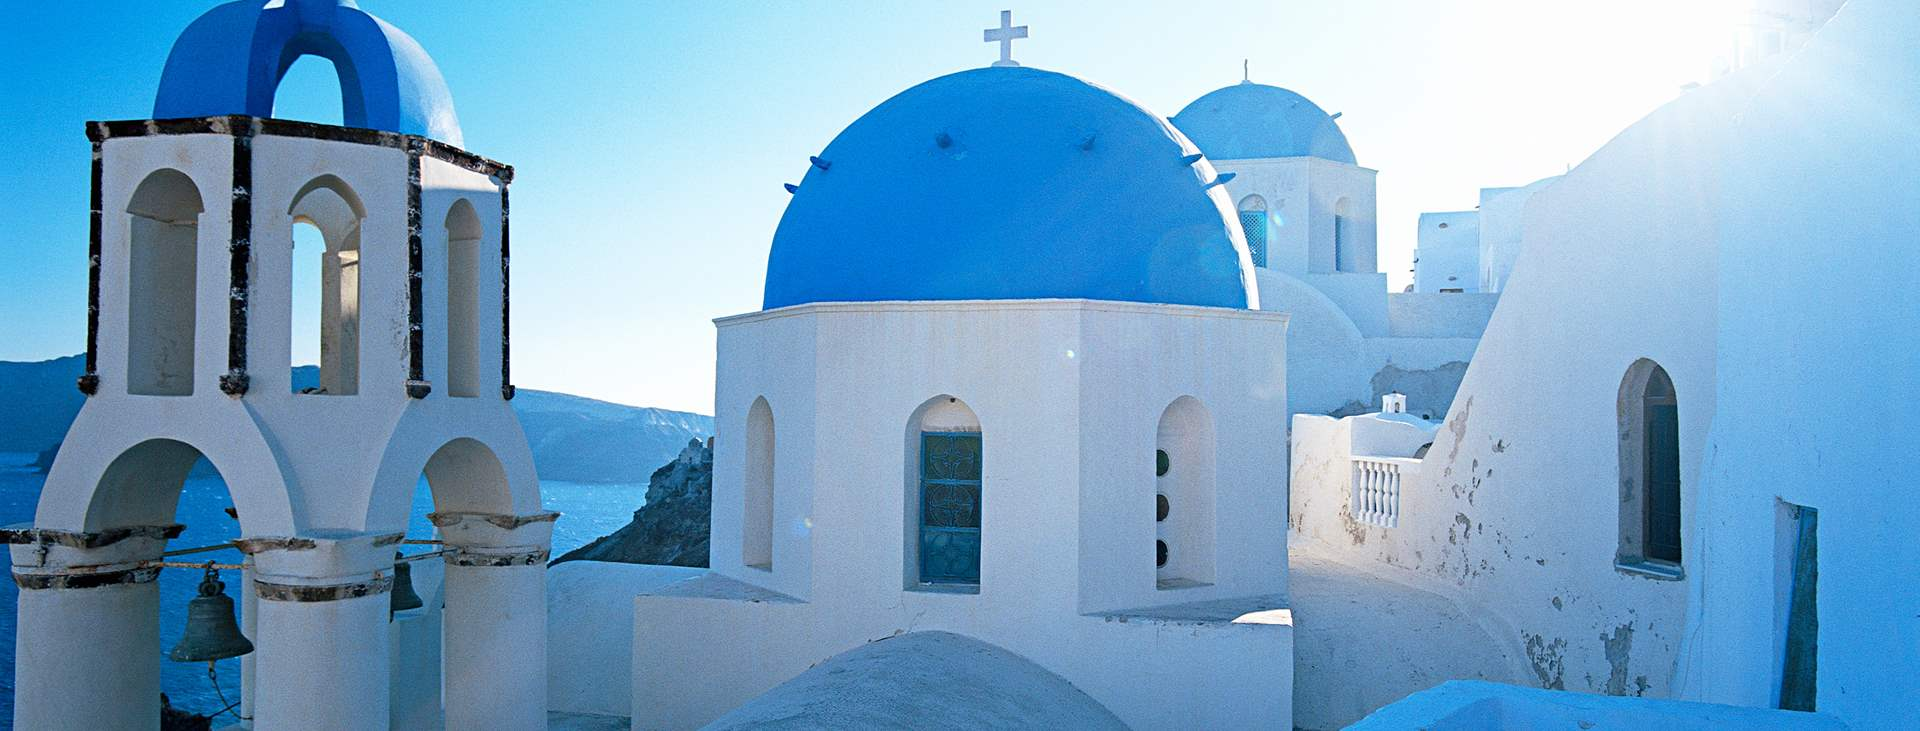 Reiser til den greske øya Santorini